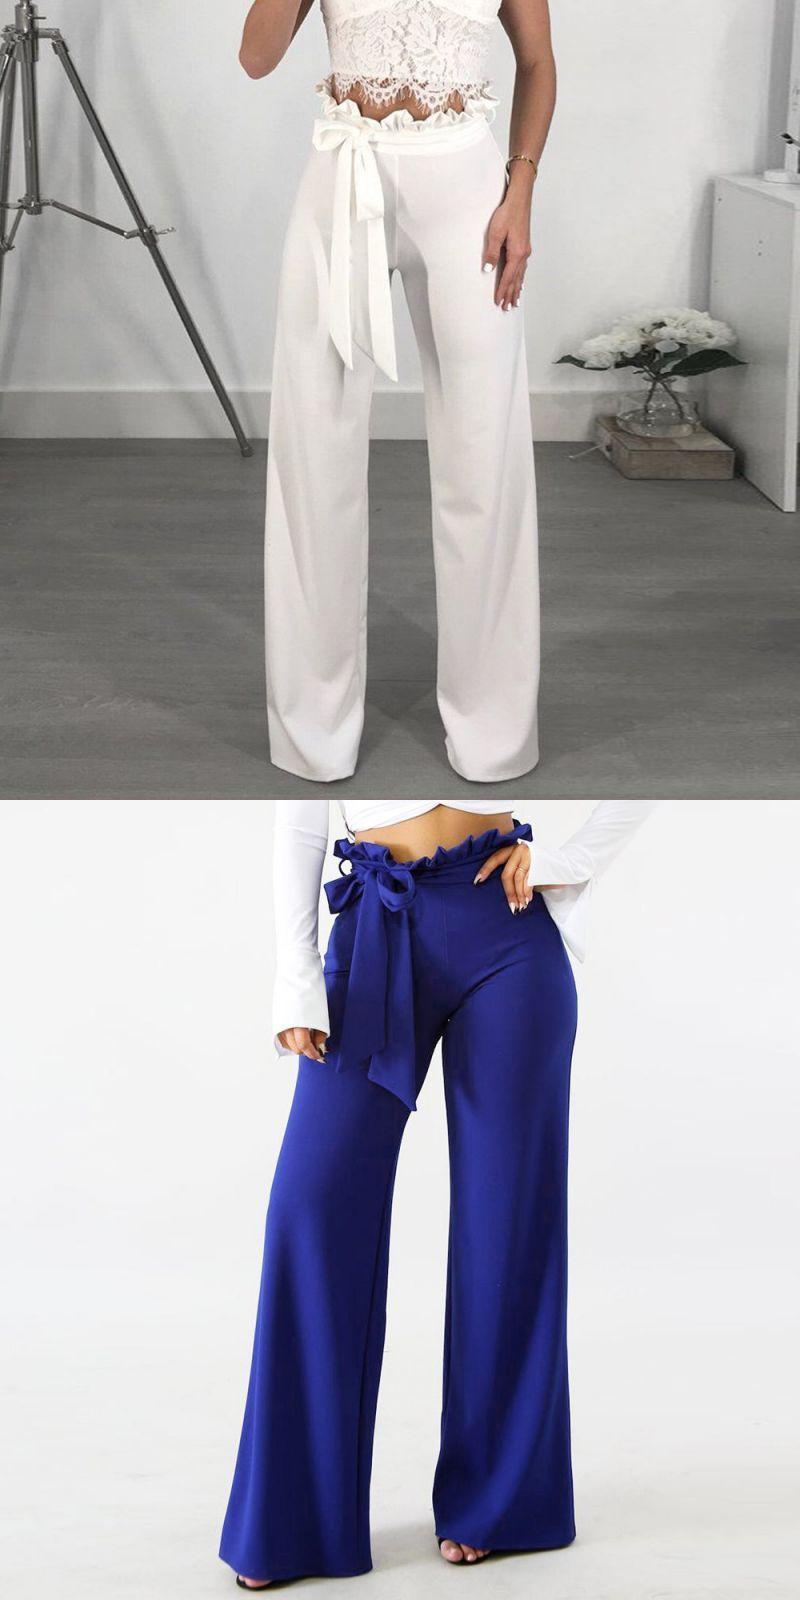 558b08e7b6448 Wide leg pants belted zipper plus size trousers women frill waist ruffle  high waist elegant ol style pants pantalon femme 2018  polyester  full   length ...